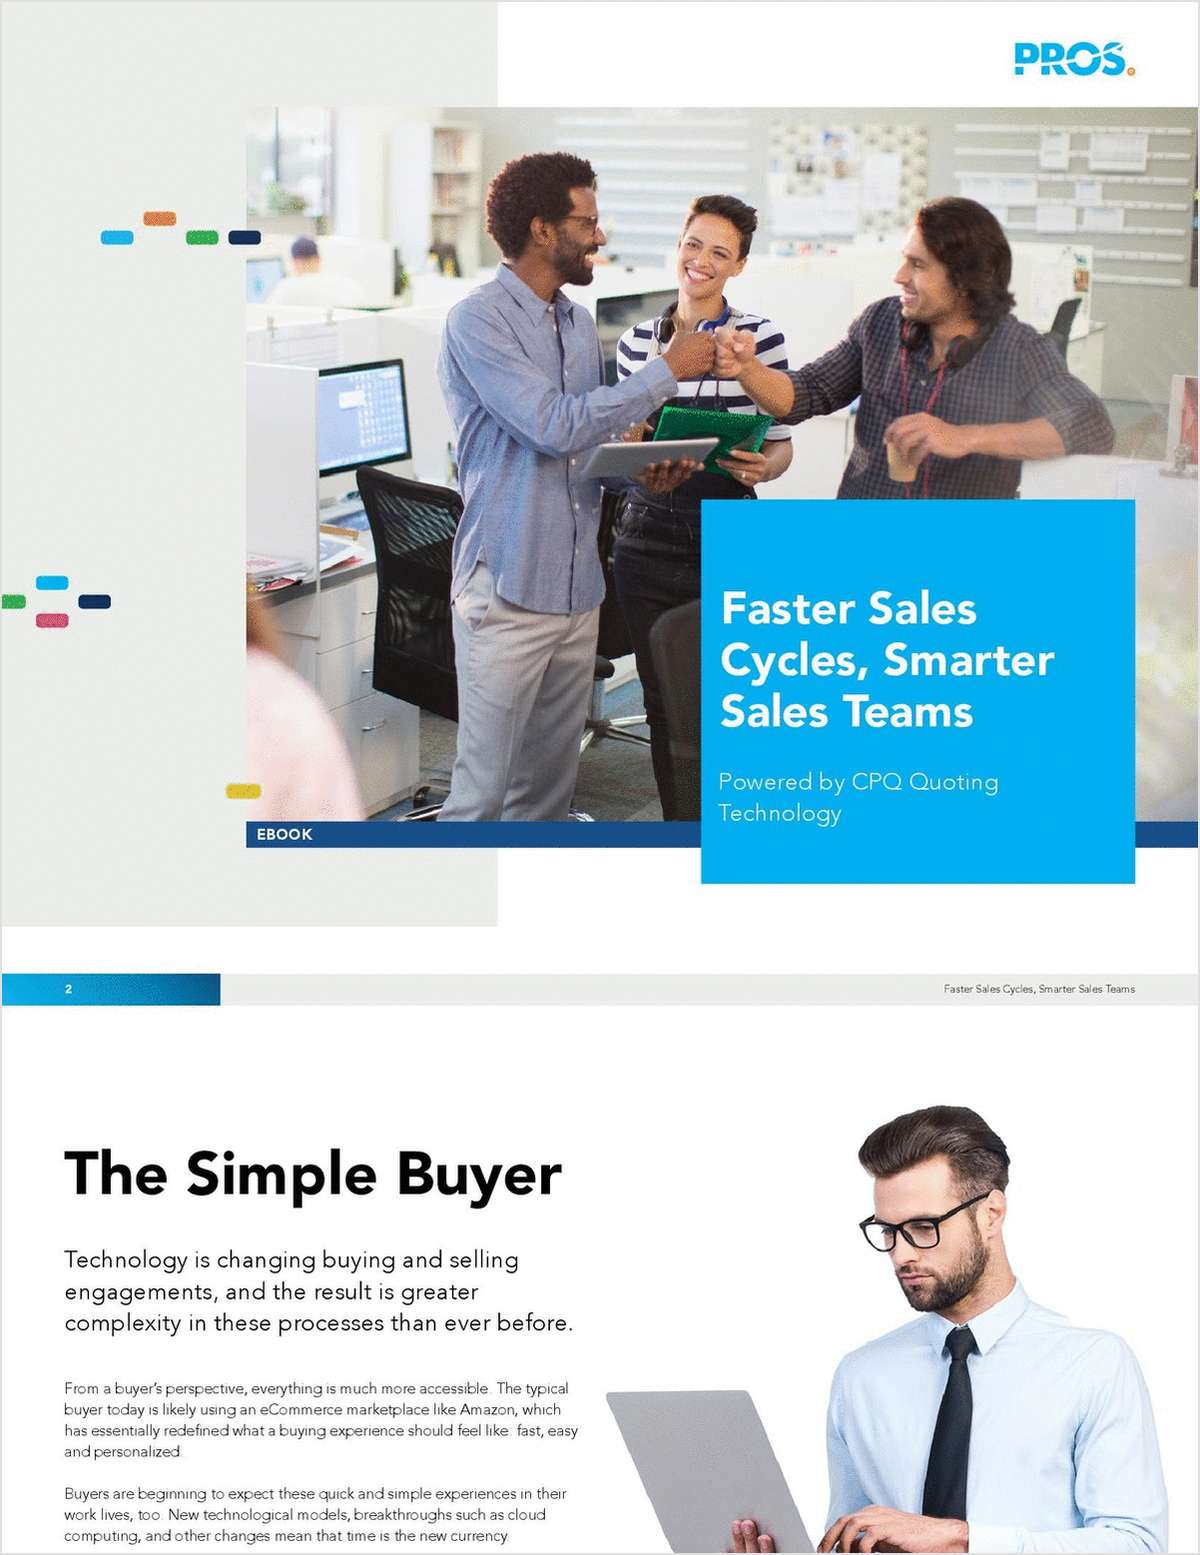 Faster Sales Cycles, Smarter Sales Teams